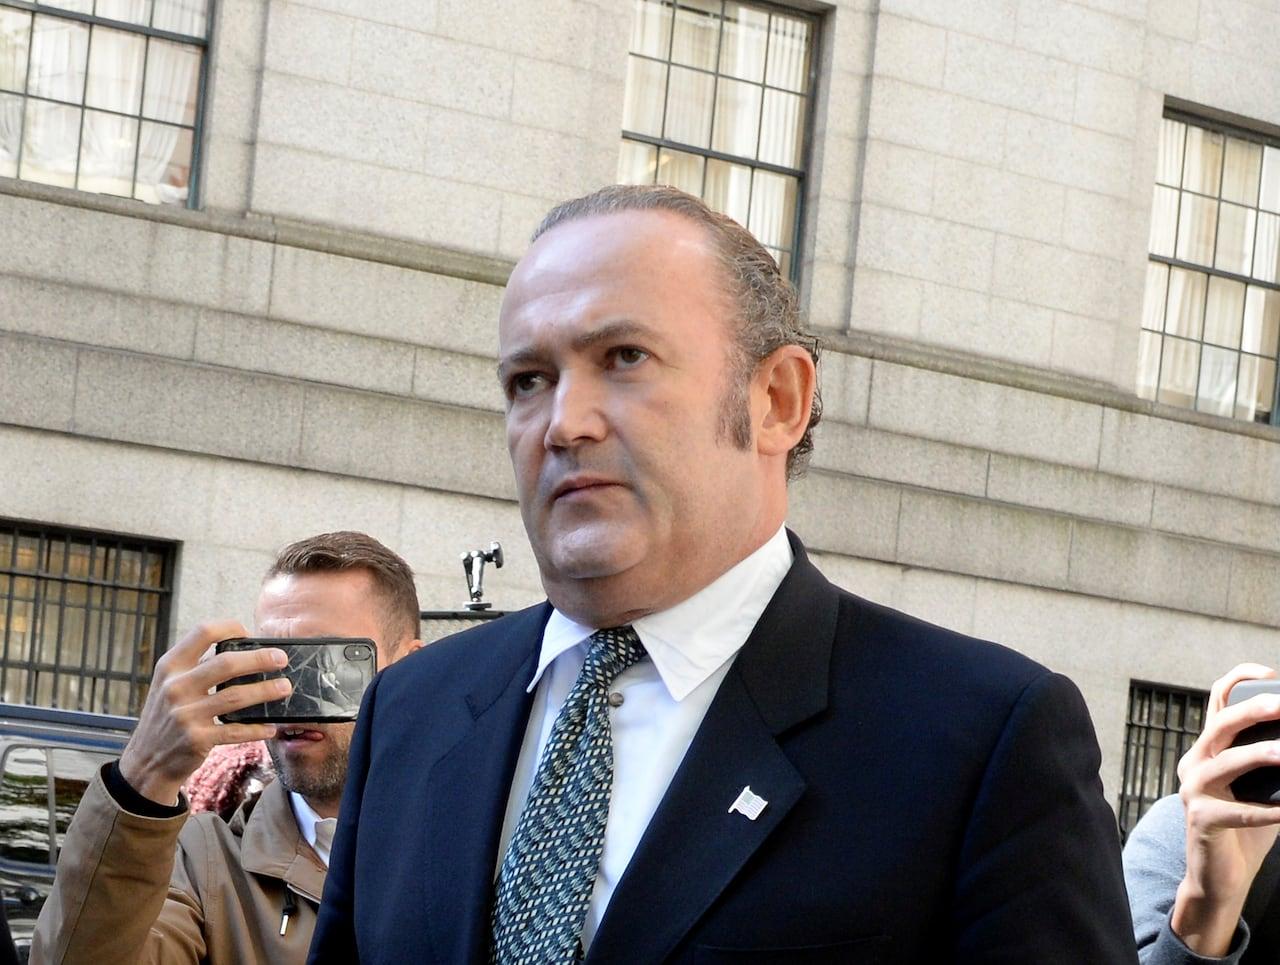 Ireland's first gay prime minister leo varadkar formally elected